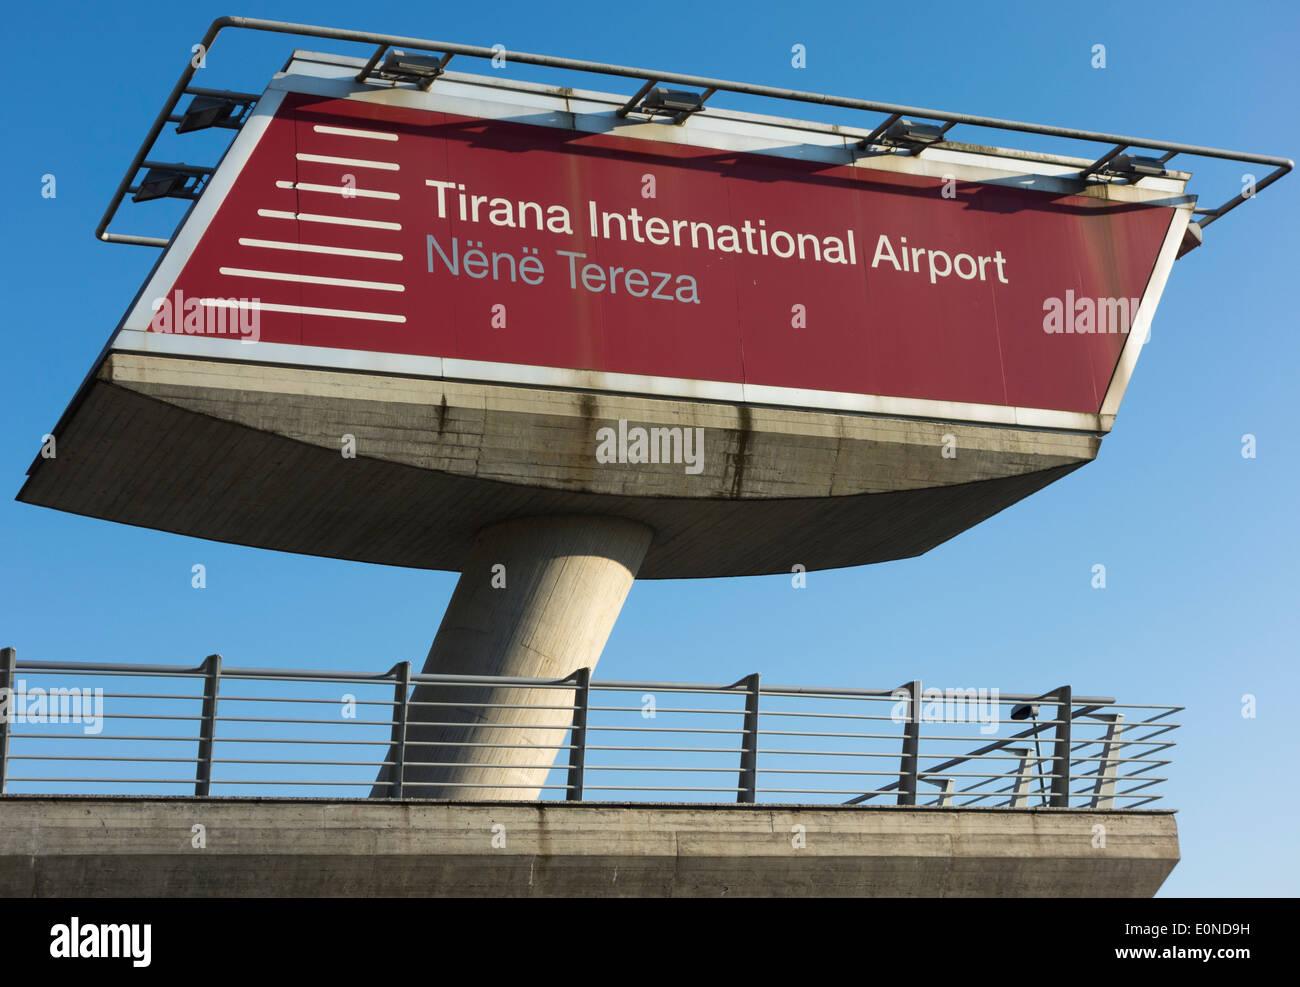 Mother Teresa International Airport, Tirana, Albania - Stock Image